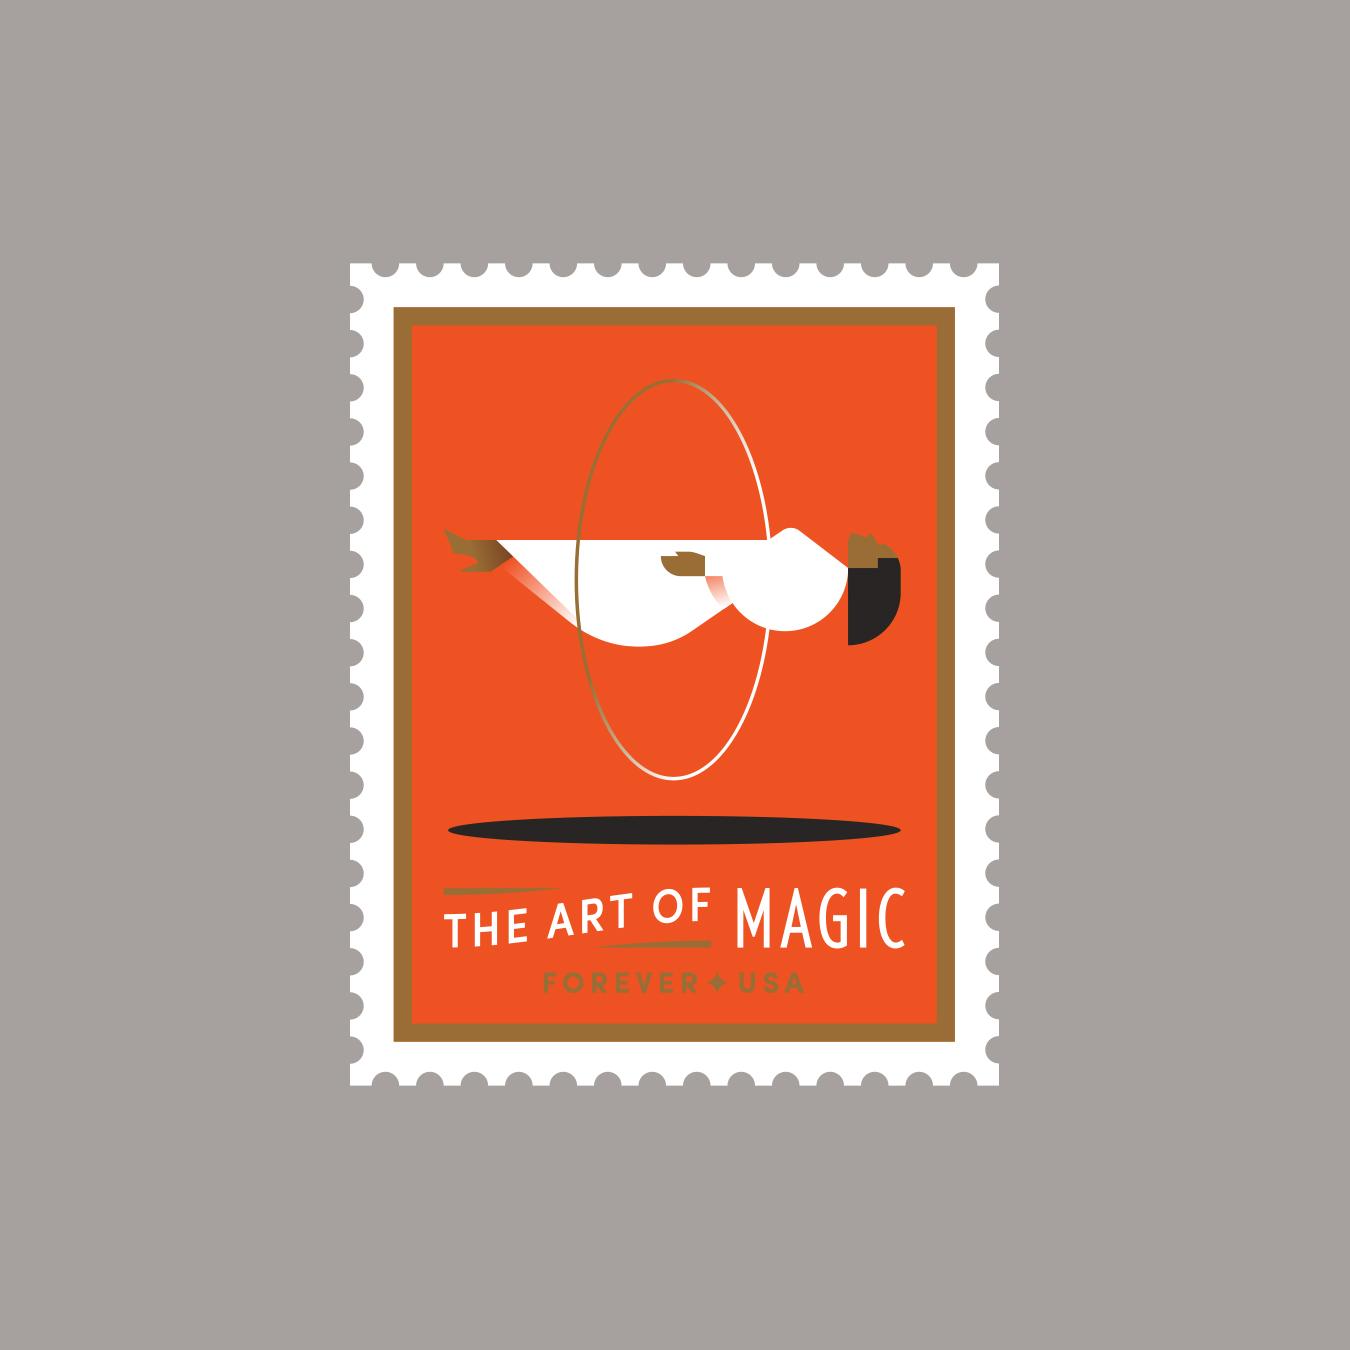 The Art of Magic Levitating Woman Stamp